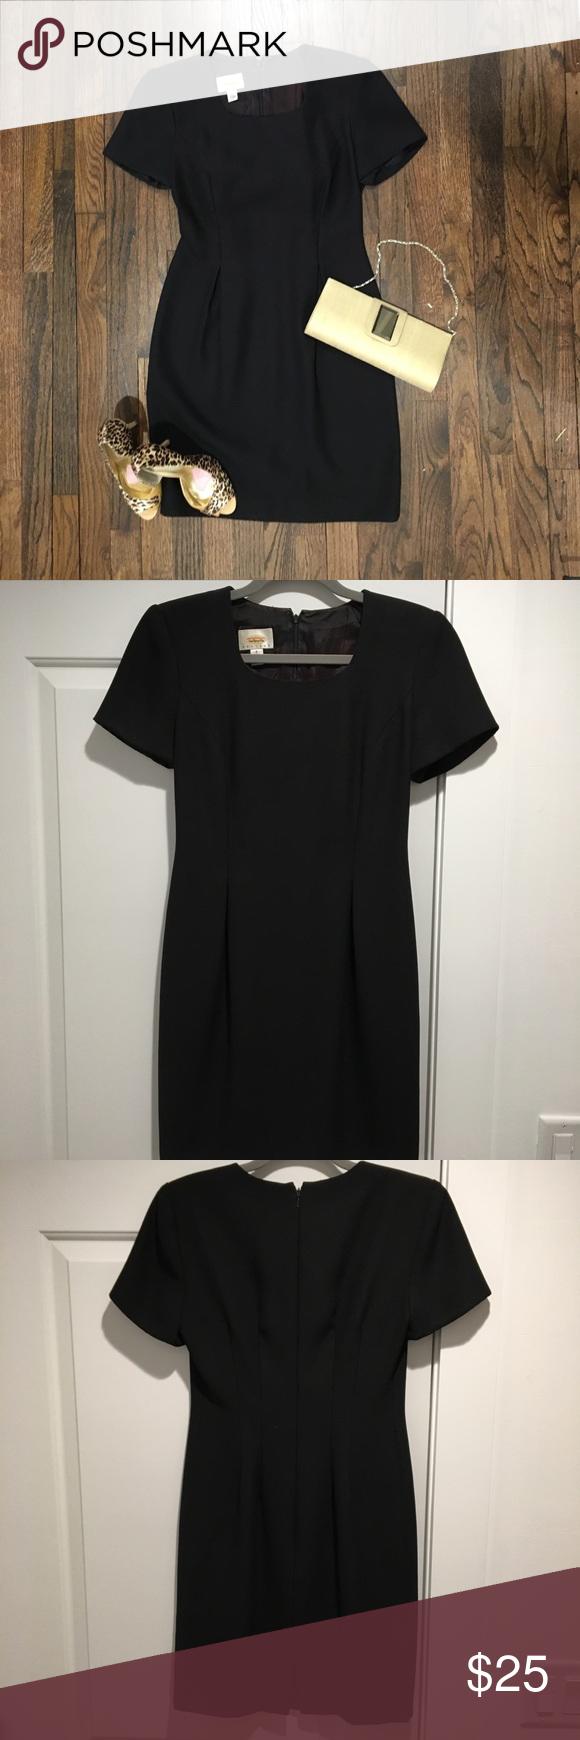 Final Clearance Petite Black Dresses Talbots Dress Clothes Design [ 1740 x 580 Pixel ]